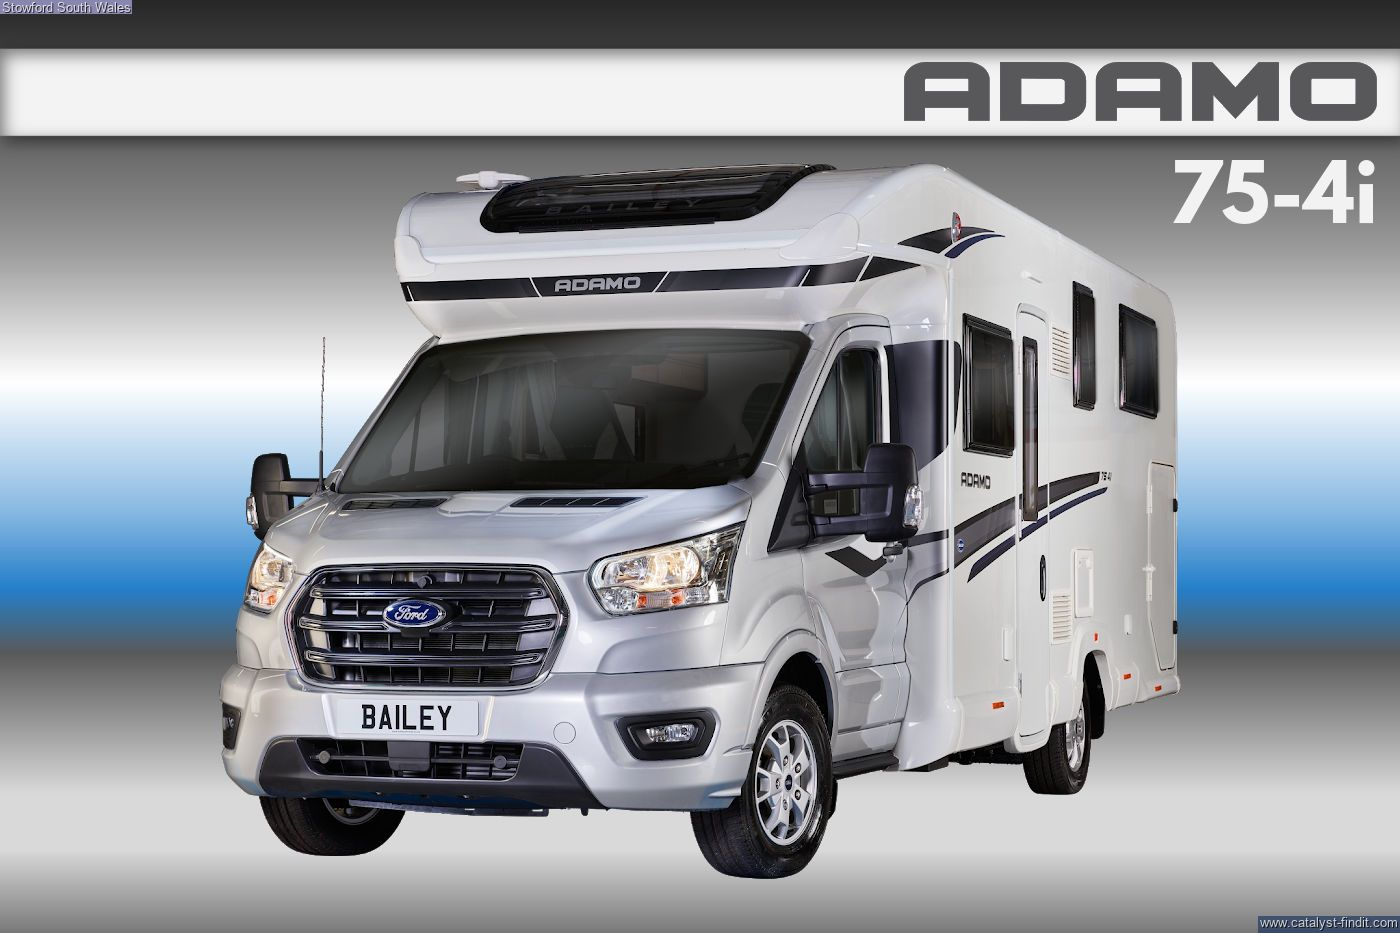 Bailey Adamo 75-4i 2022